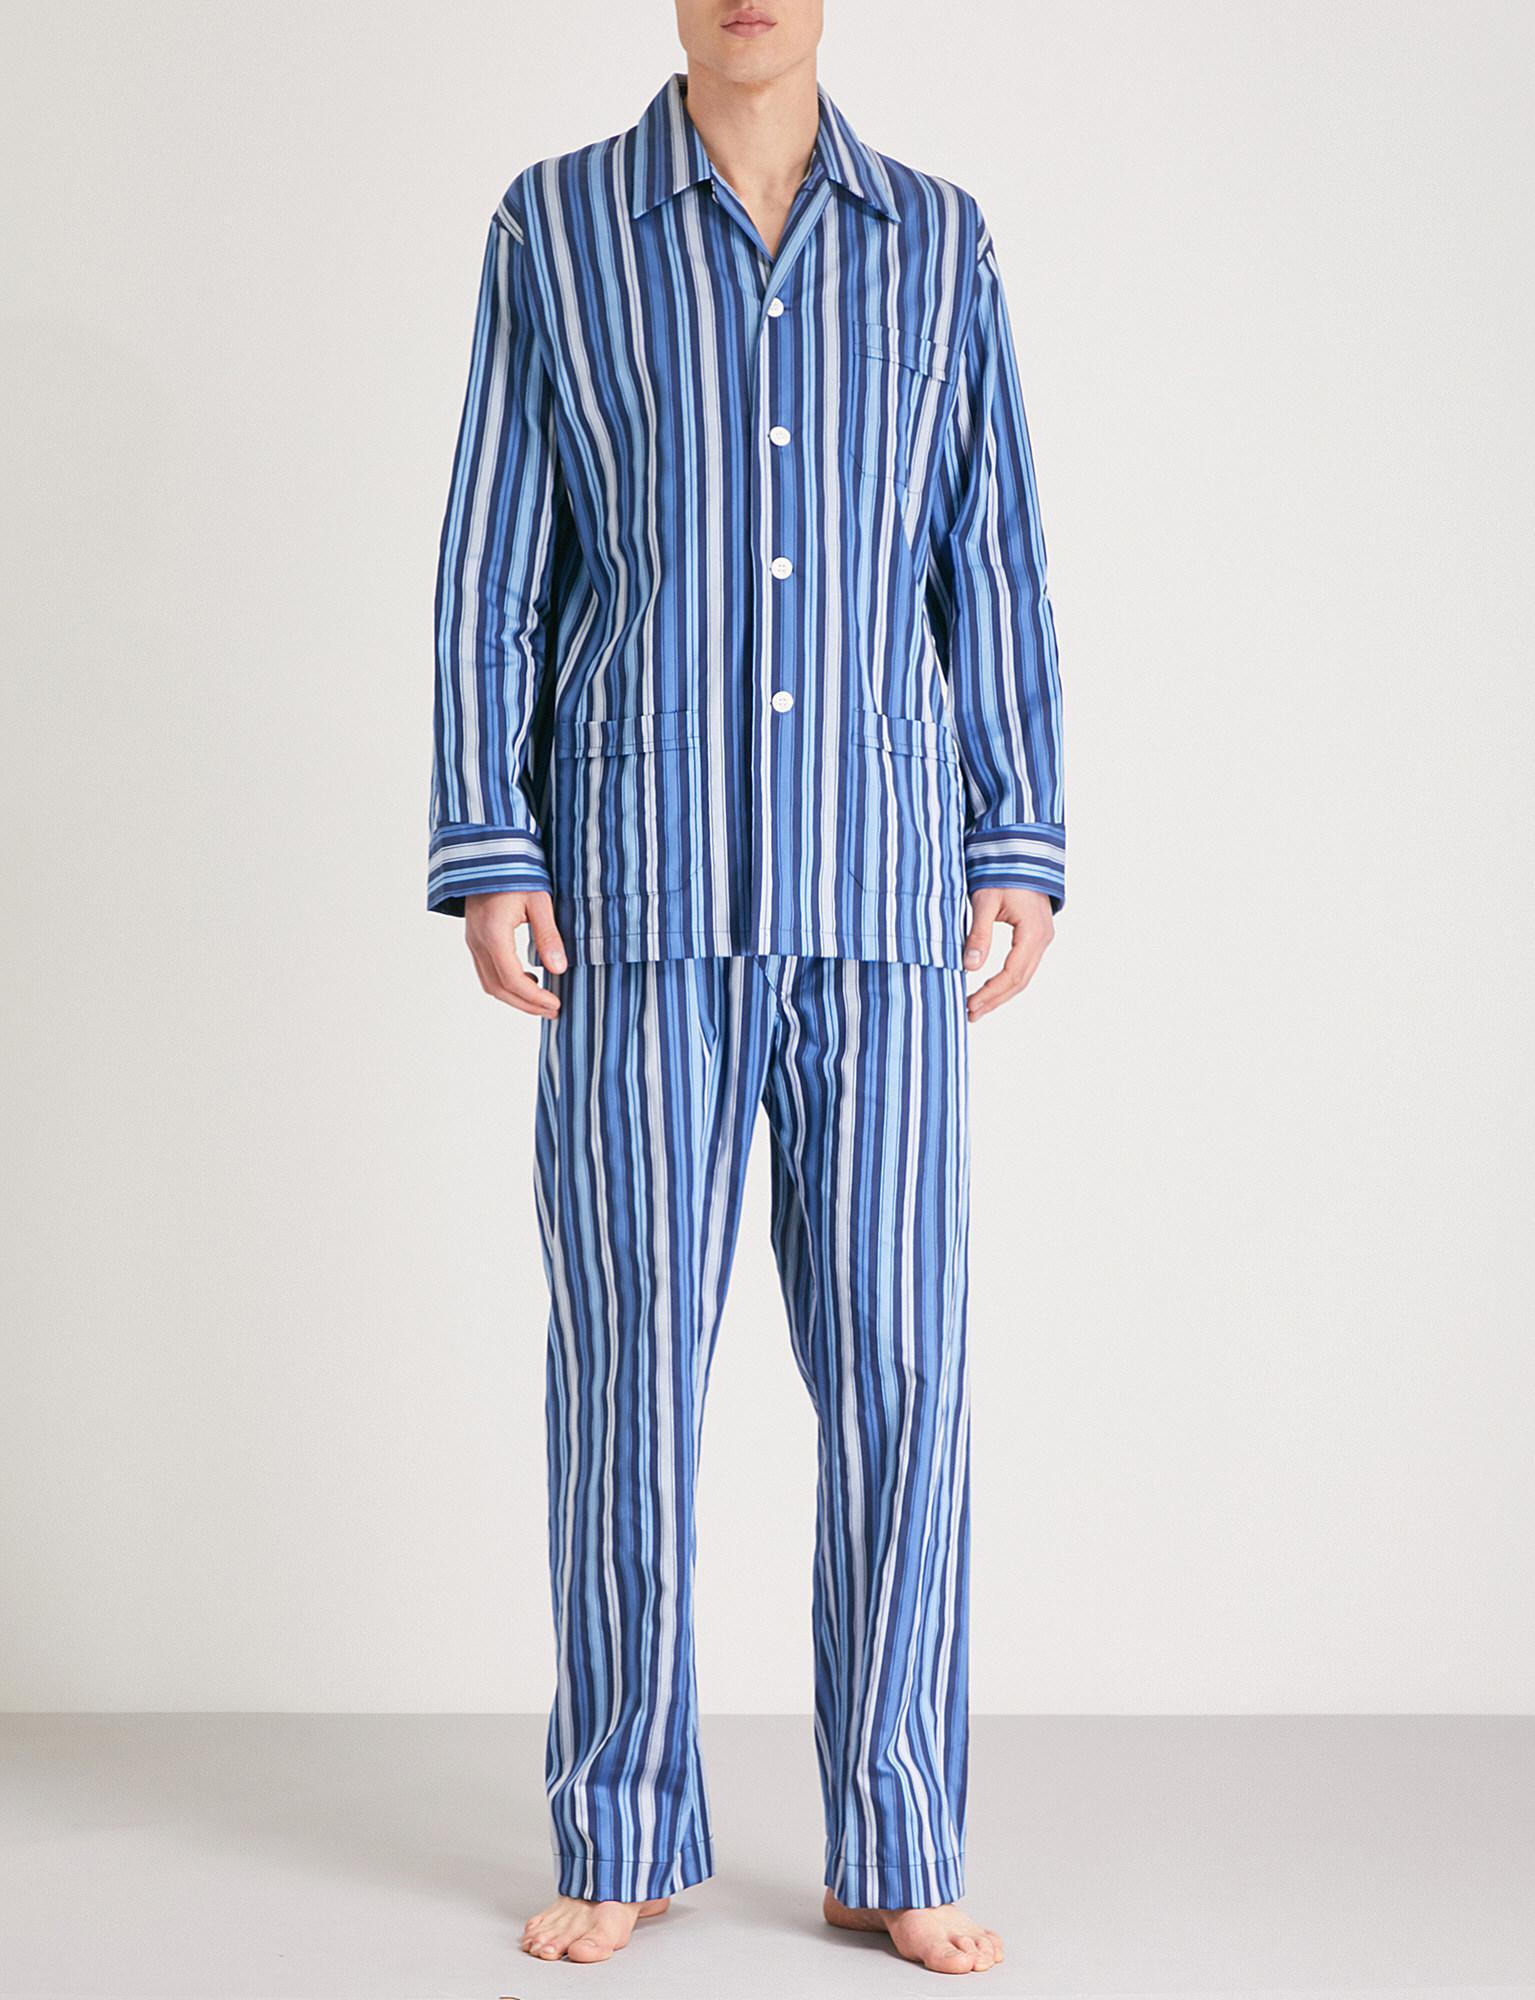 aa16c95494 Lyst - Derek Rose Striped Cotton Pyjama Set in Blue for Men